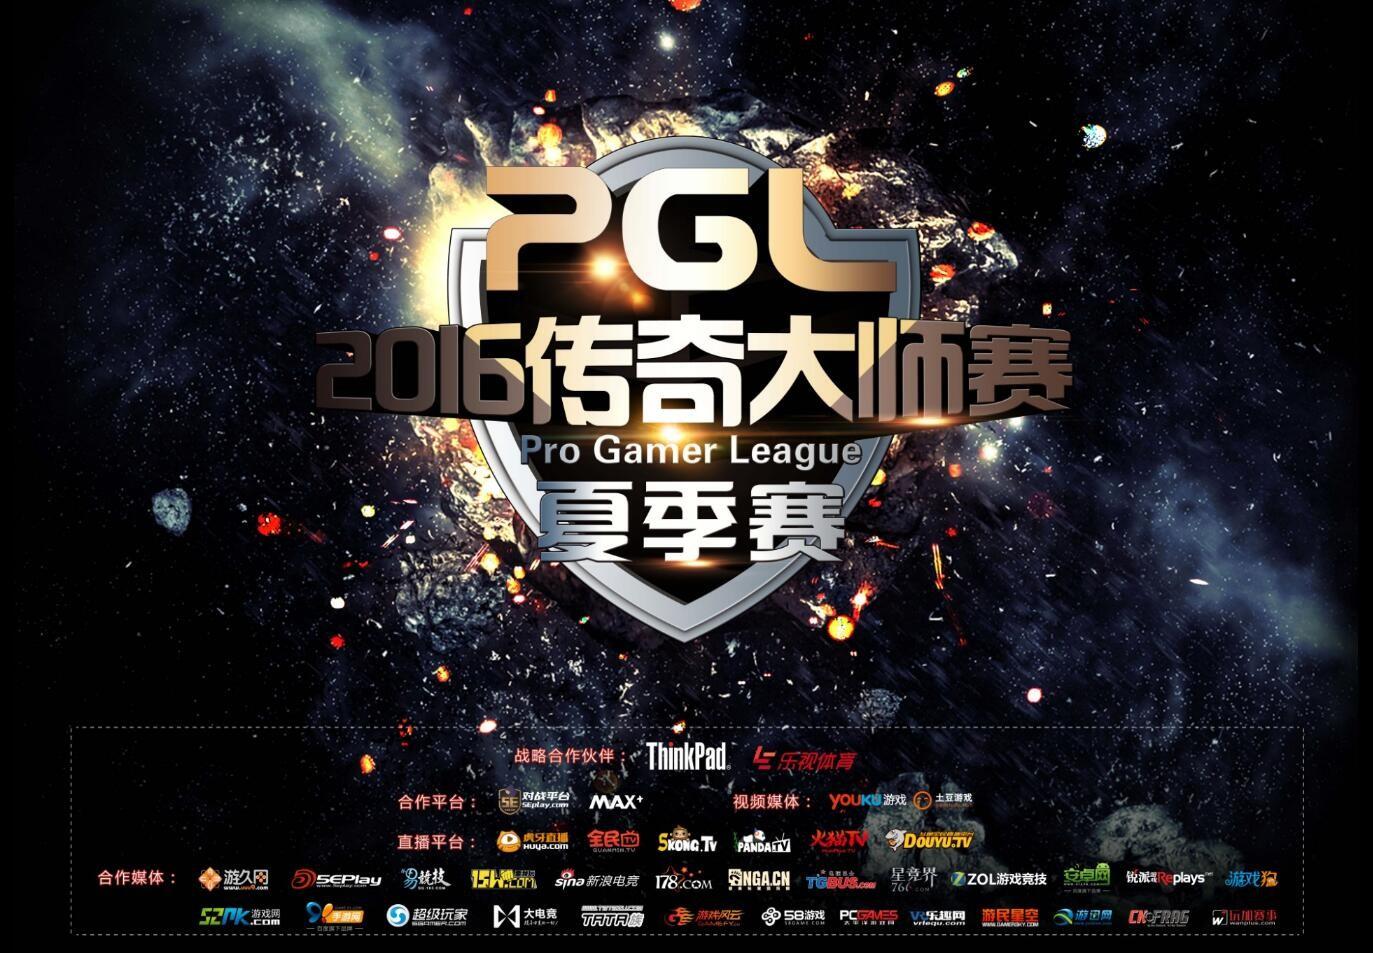 PGL夏季赛War3真人秀 计划有变推迟播出